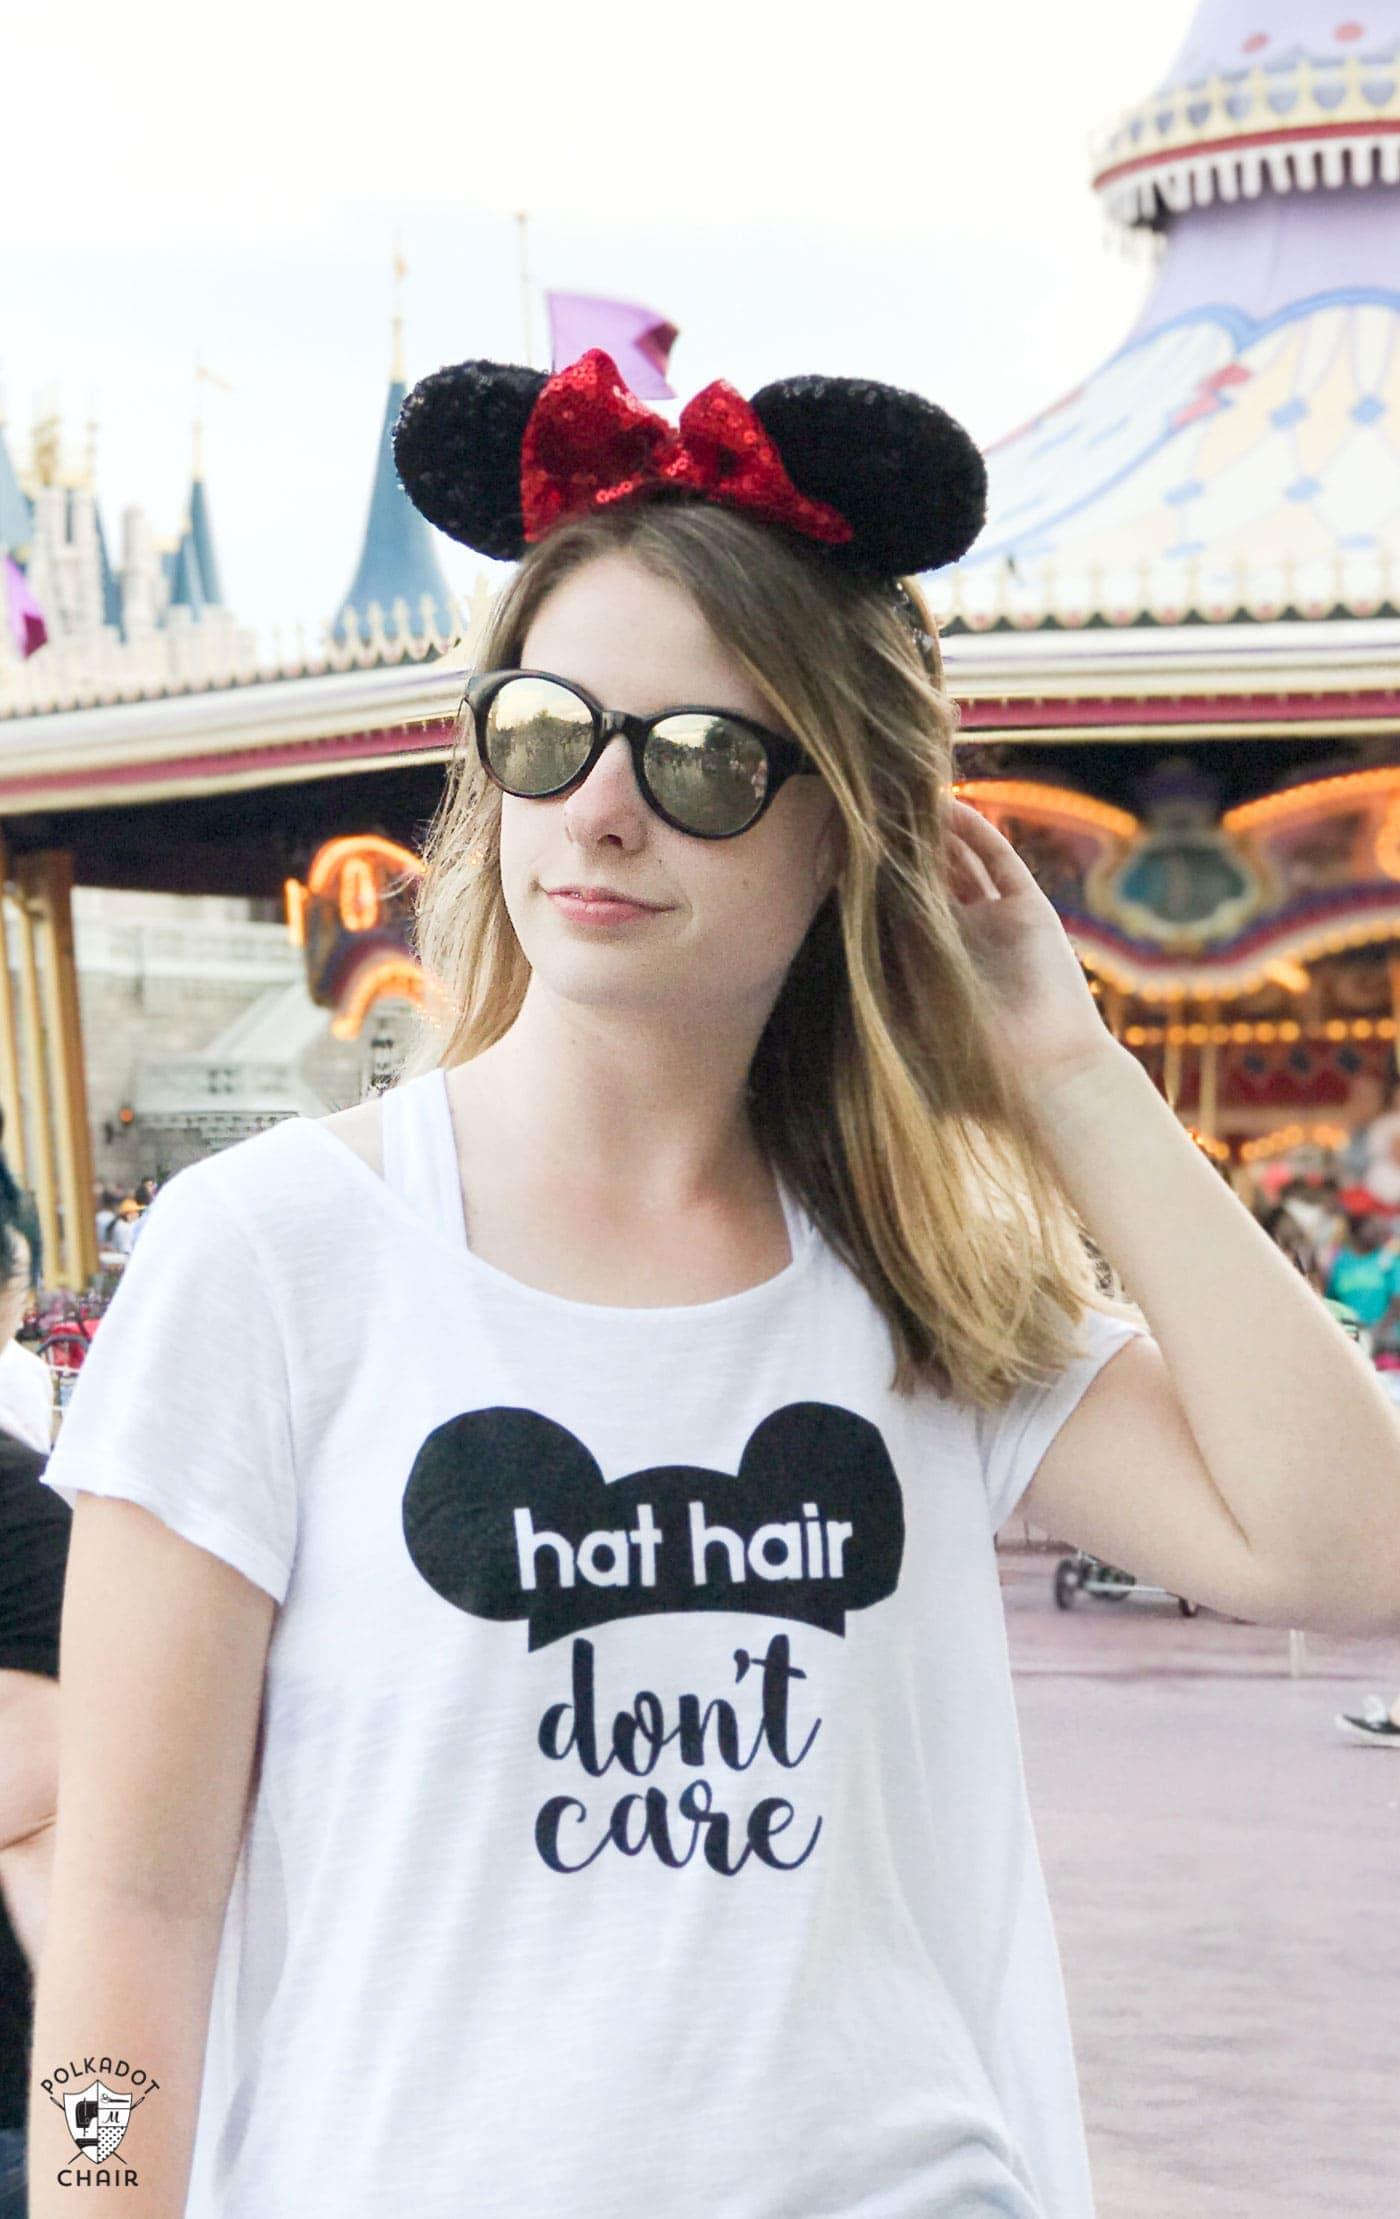 DIY Disney T Shirt Hat Hair Dont Care The Polka Dot Chair